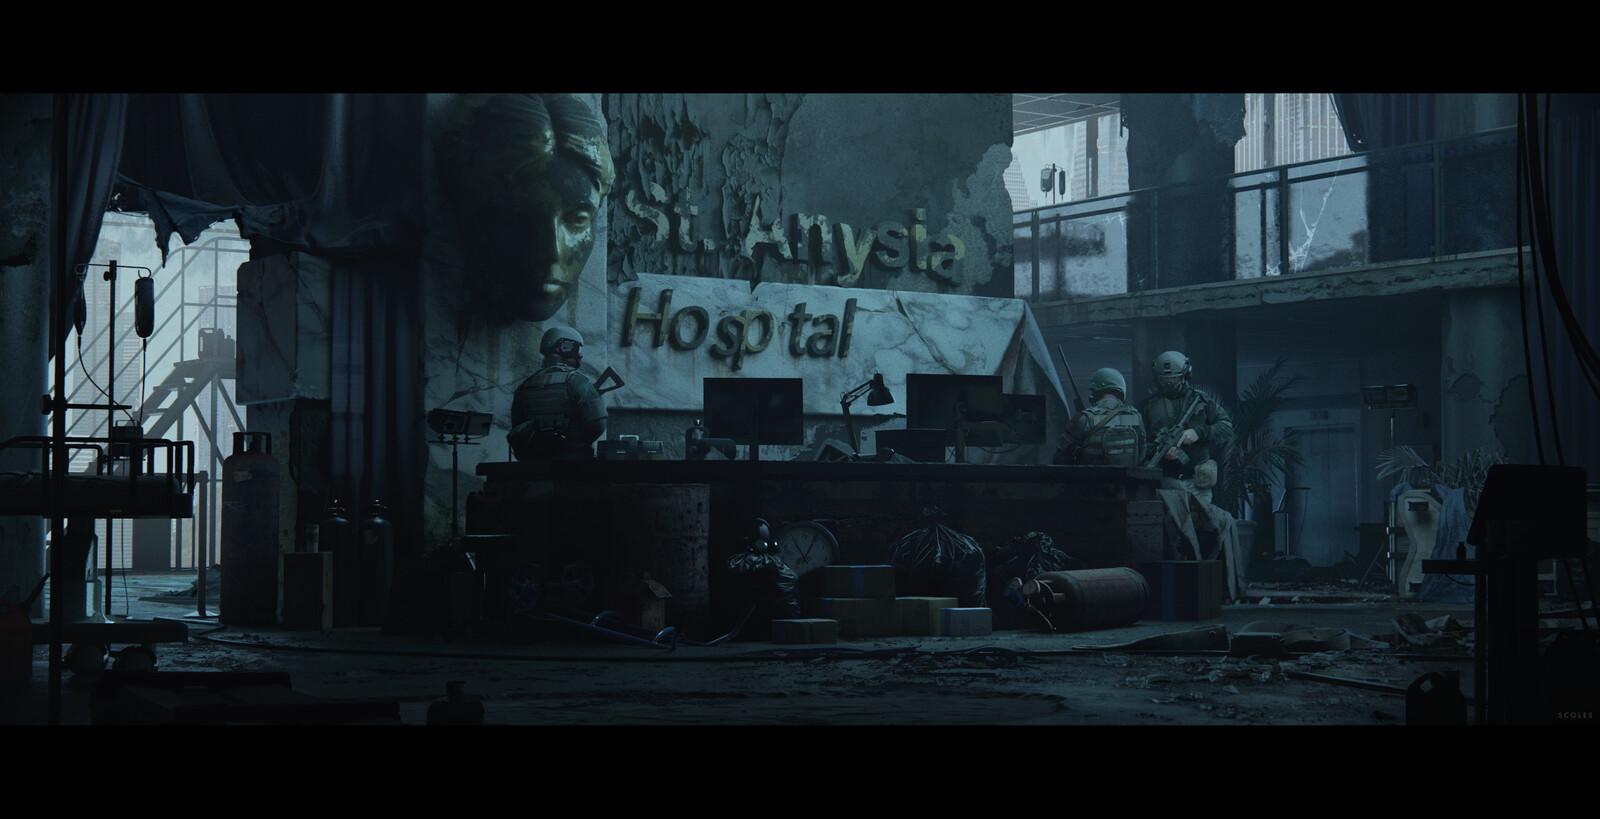 St. Anysia Hospital